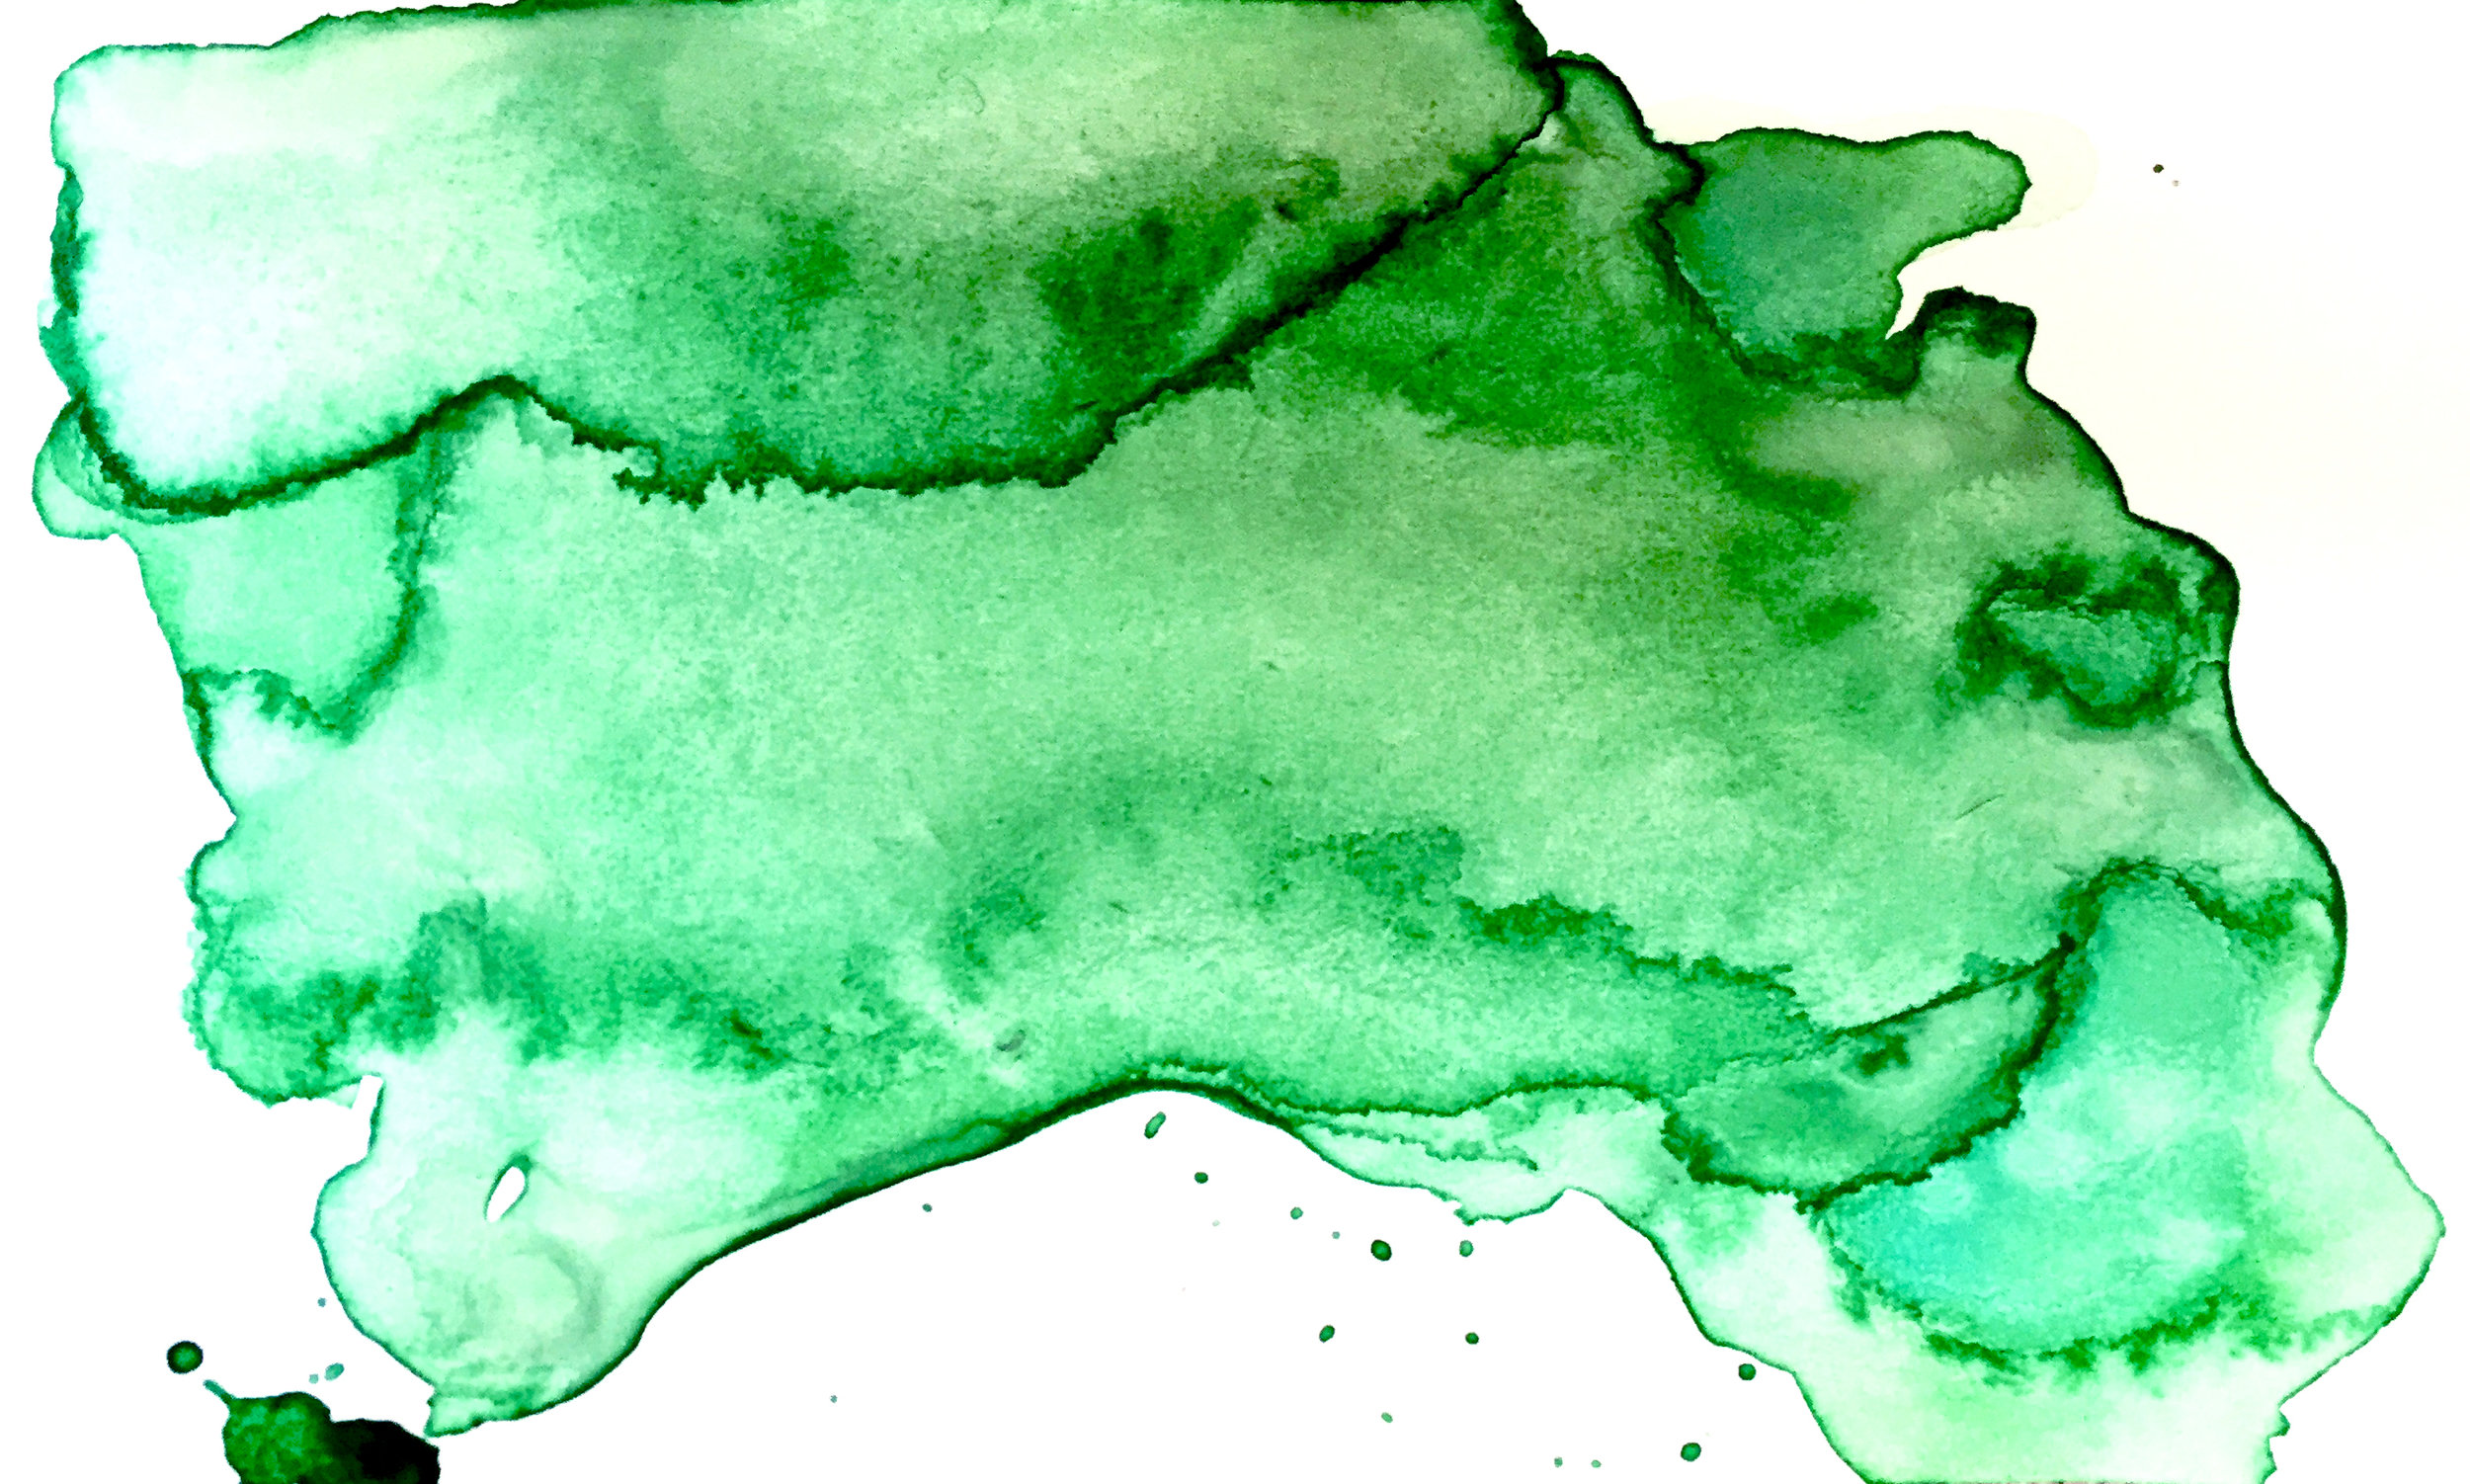 Watercolor_green3.jpg